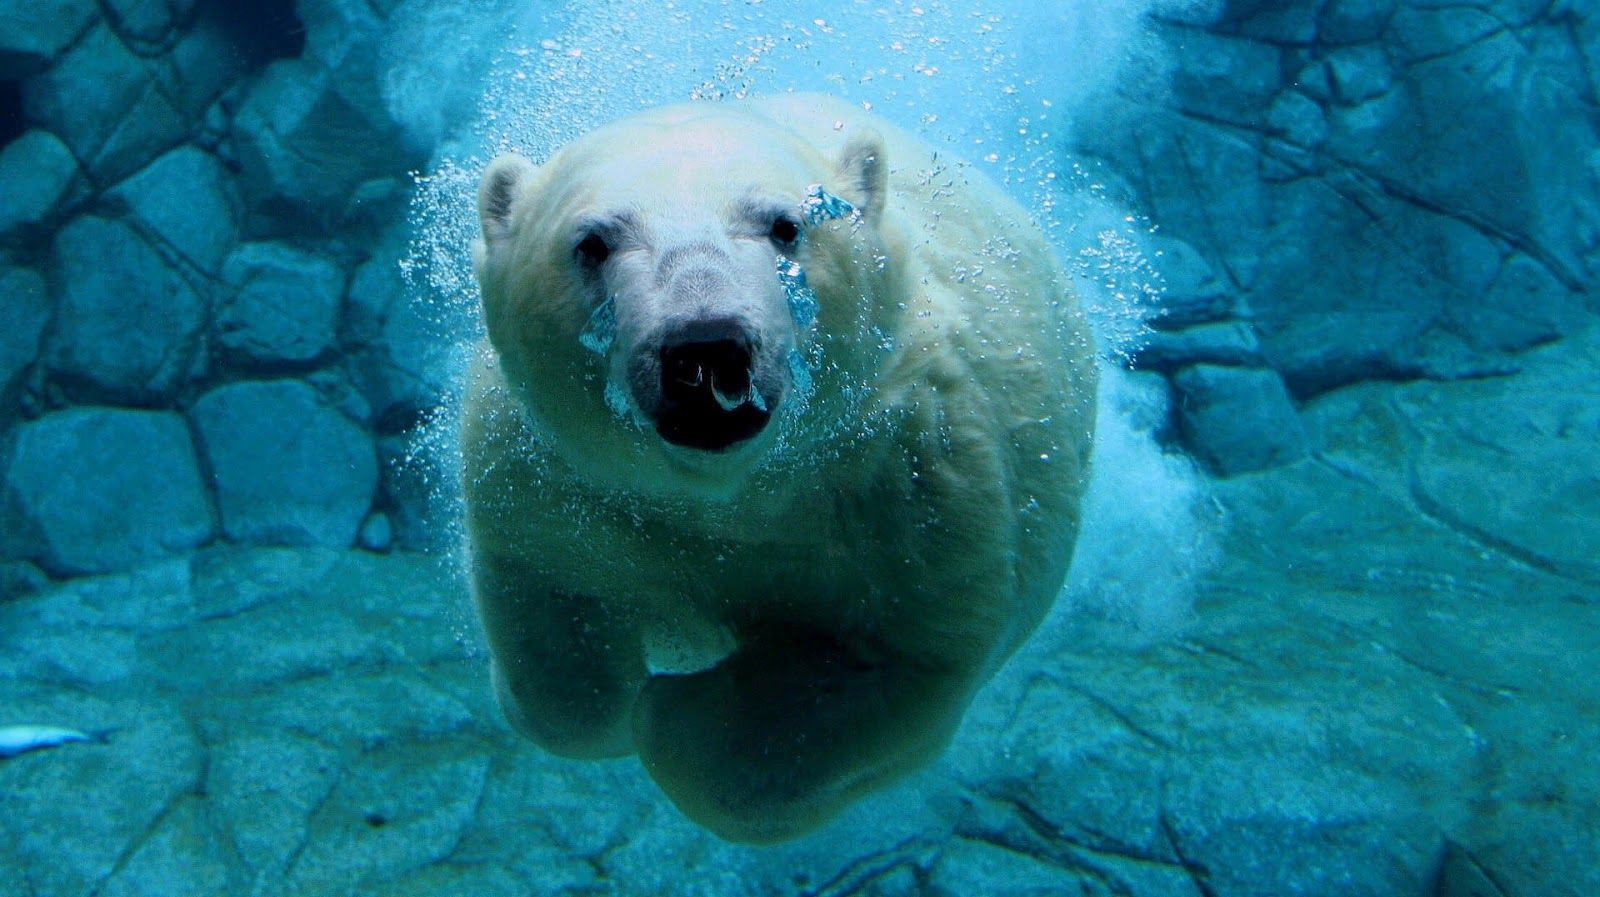 underwater animals   hd animal wallpaper with a polar bear swimming